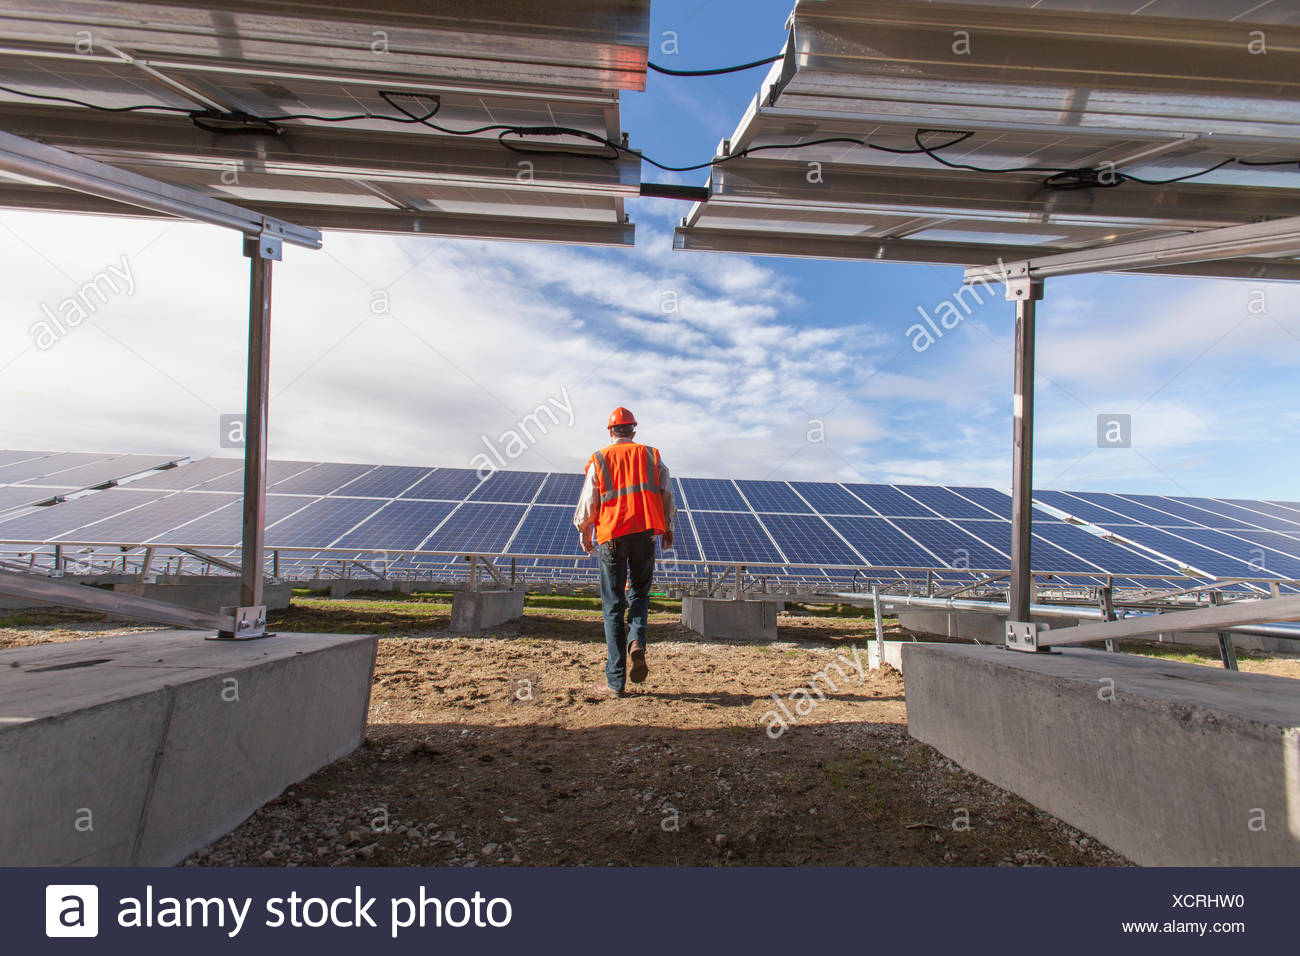 Power engineer walking toward solar photovoltaic array - Stock Image